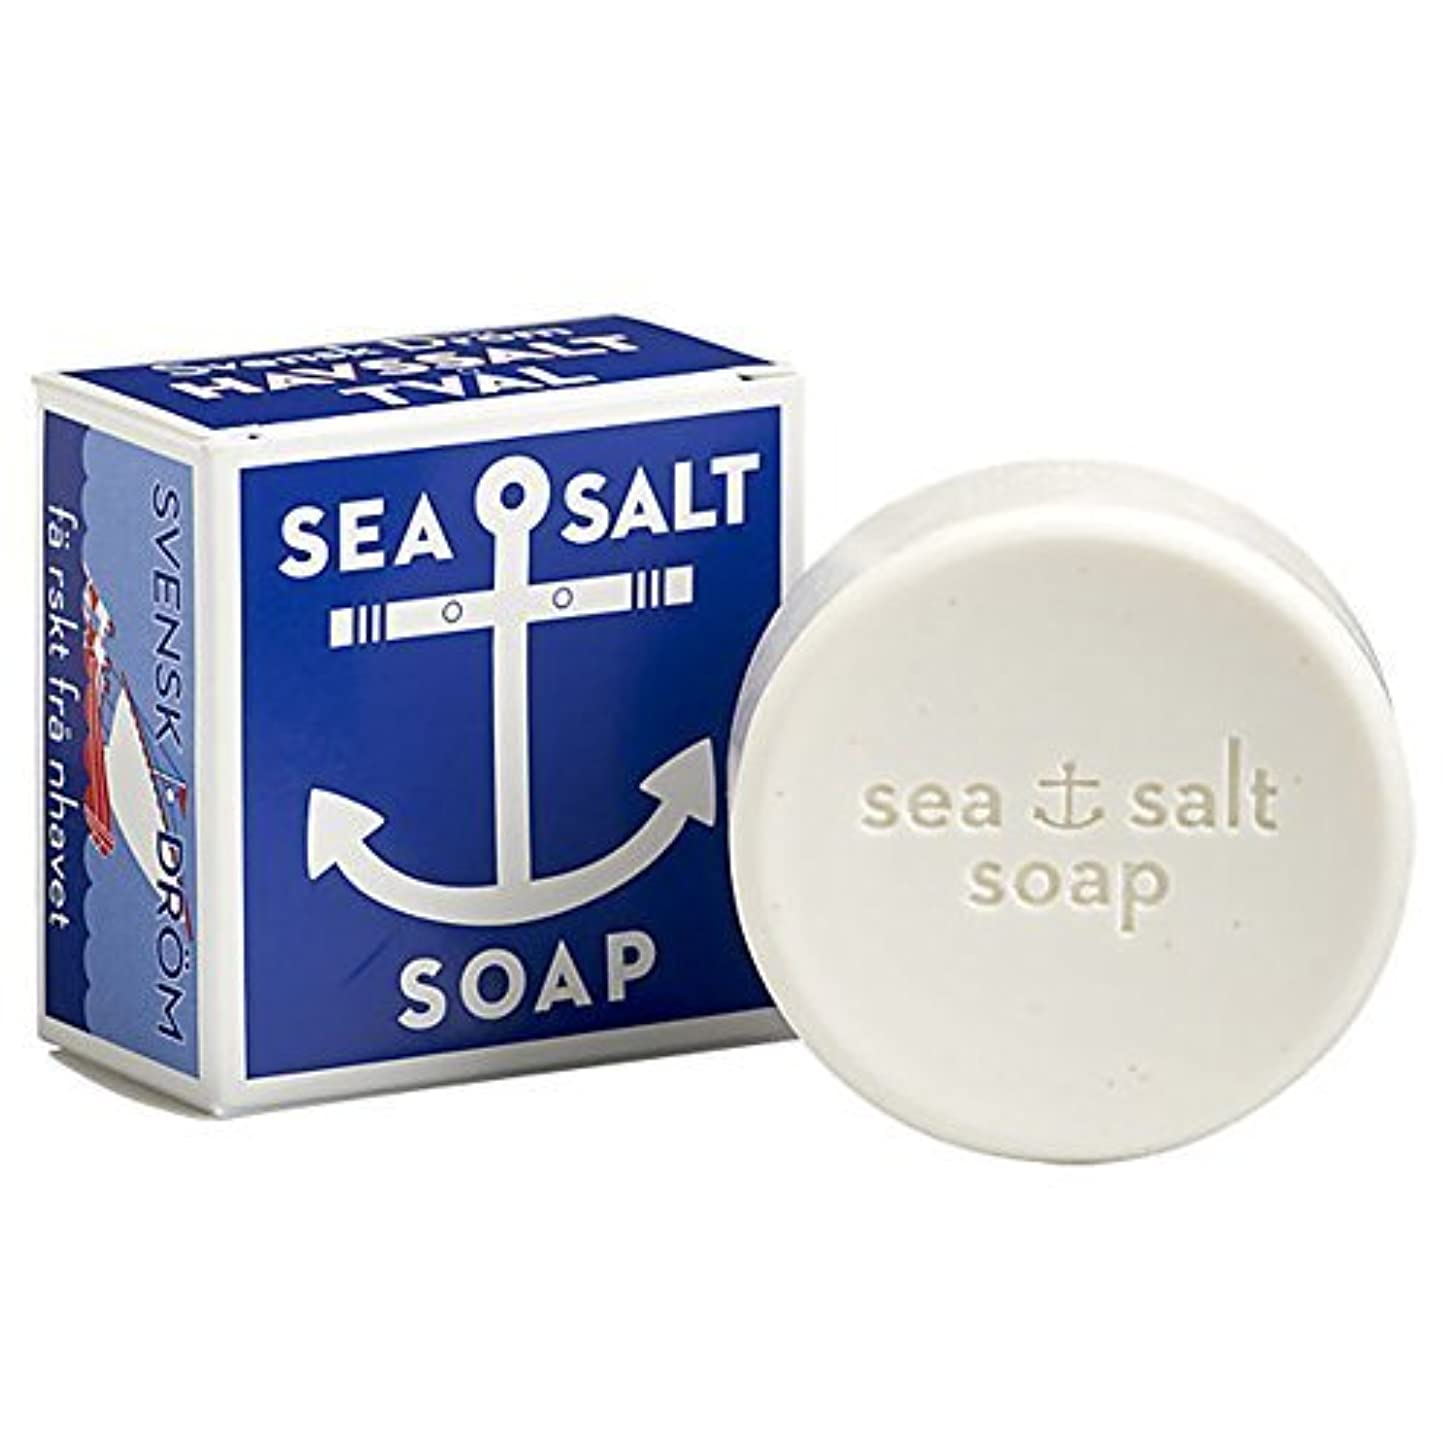 Swedish Dream Sea Salt Invigorating Bath Soap - One 4.3 oz Bar by Swedish Dream [並行輸入品]